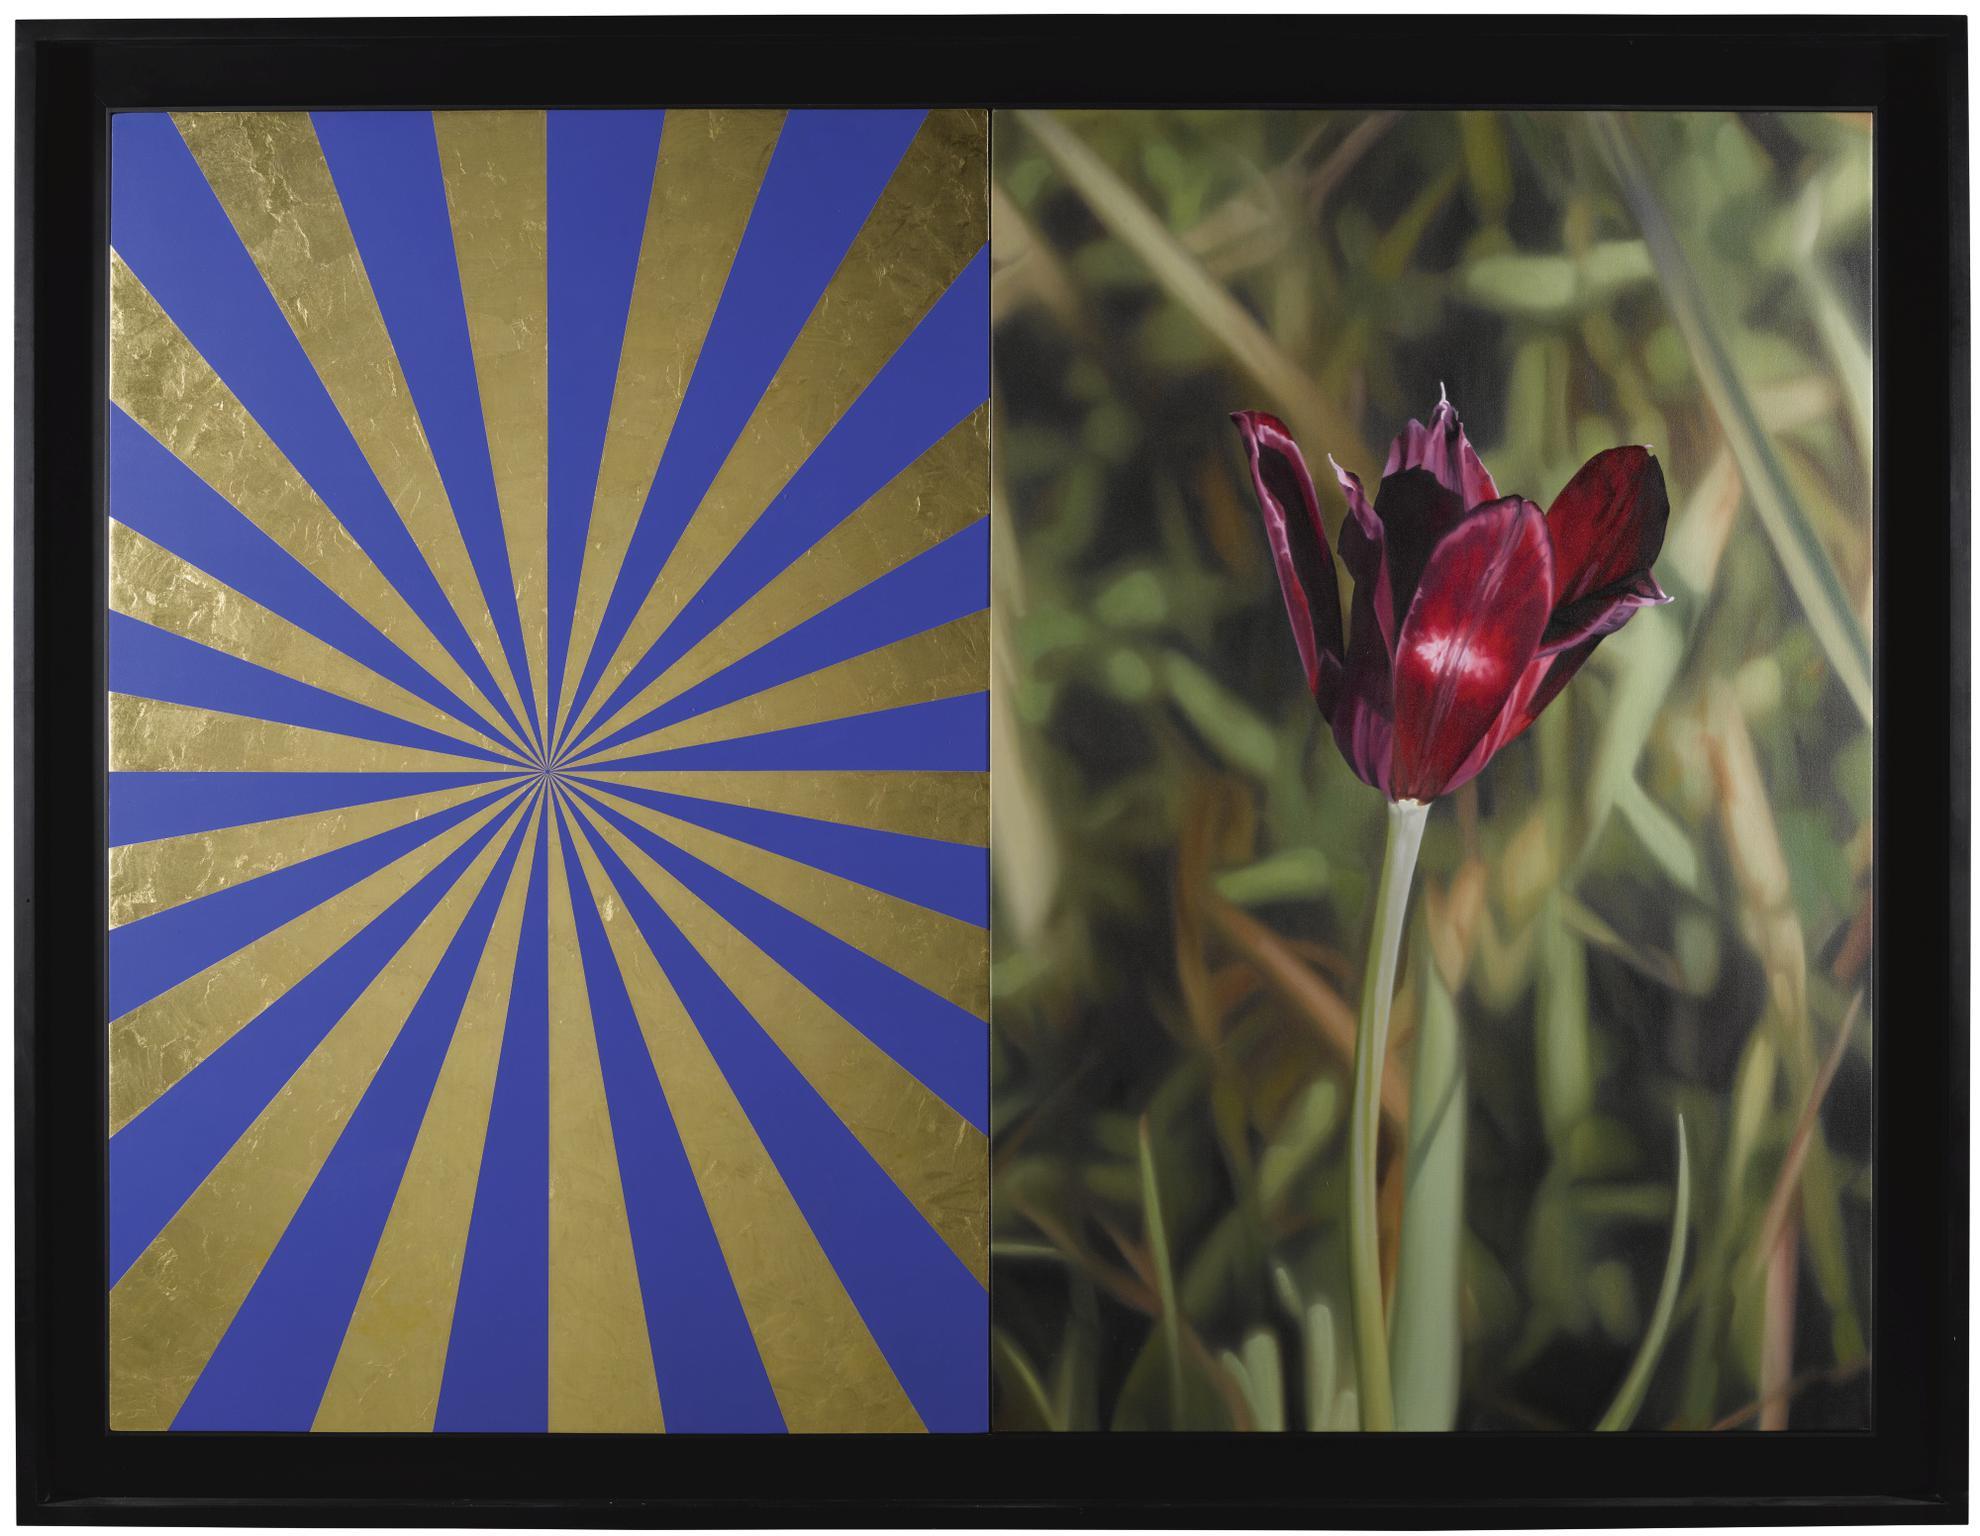 Mustafa Hulusi-Cyprus Black Tulip 3 (M) And Blue And Gold Expander (M)-2013